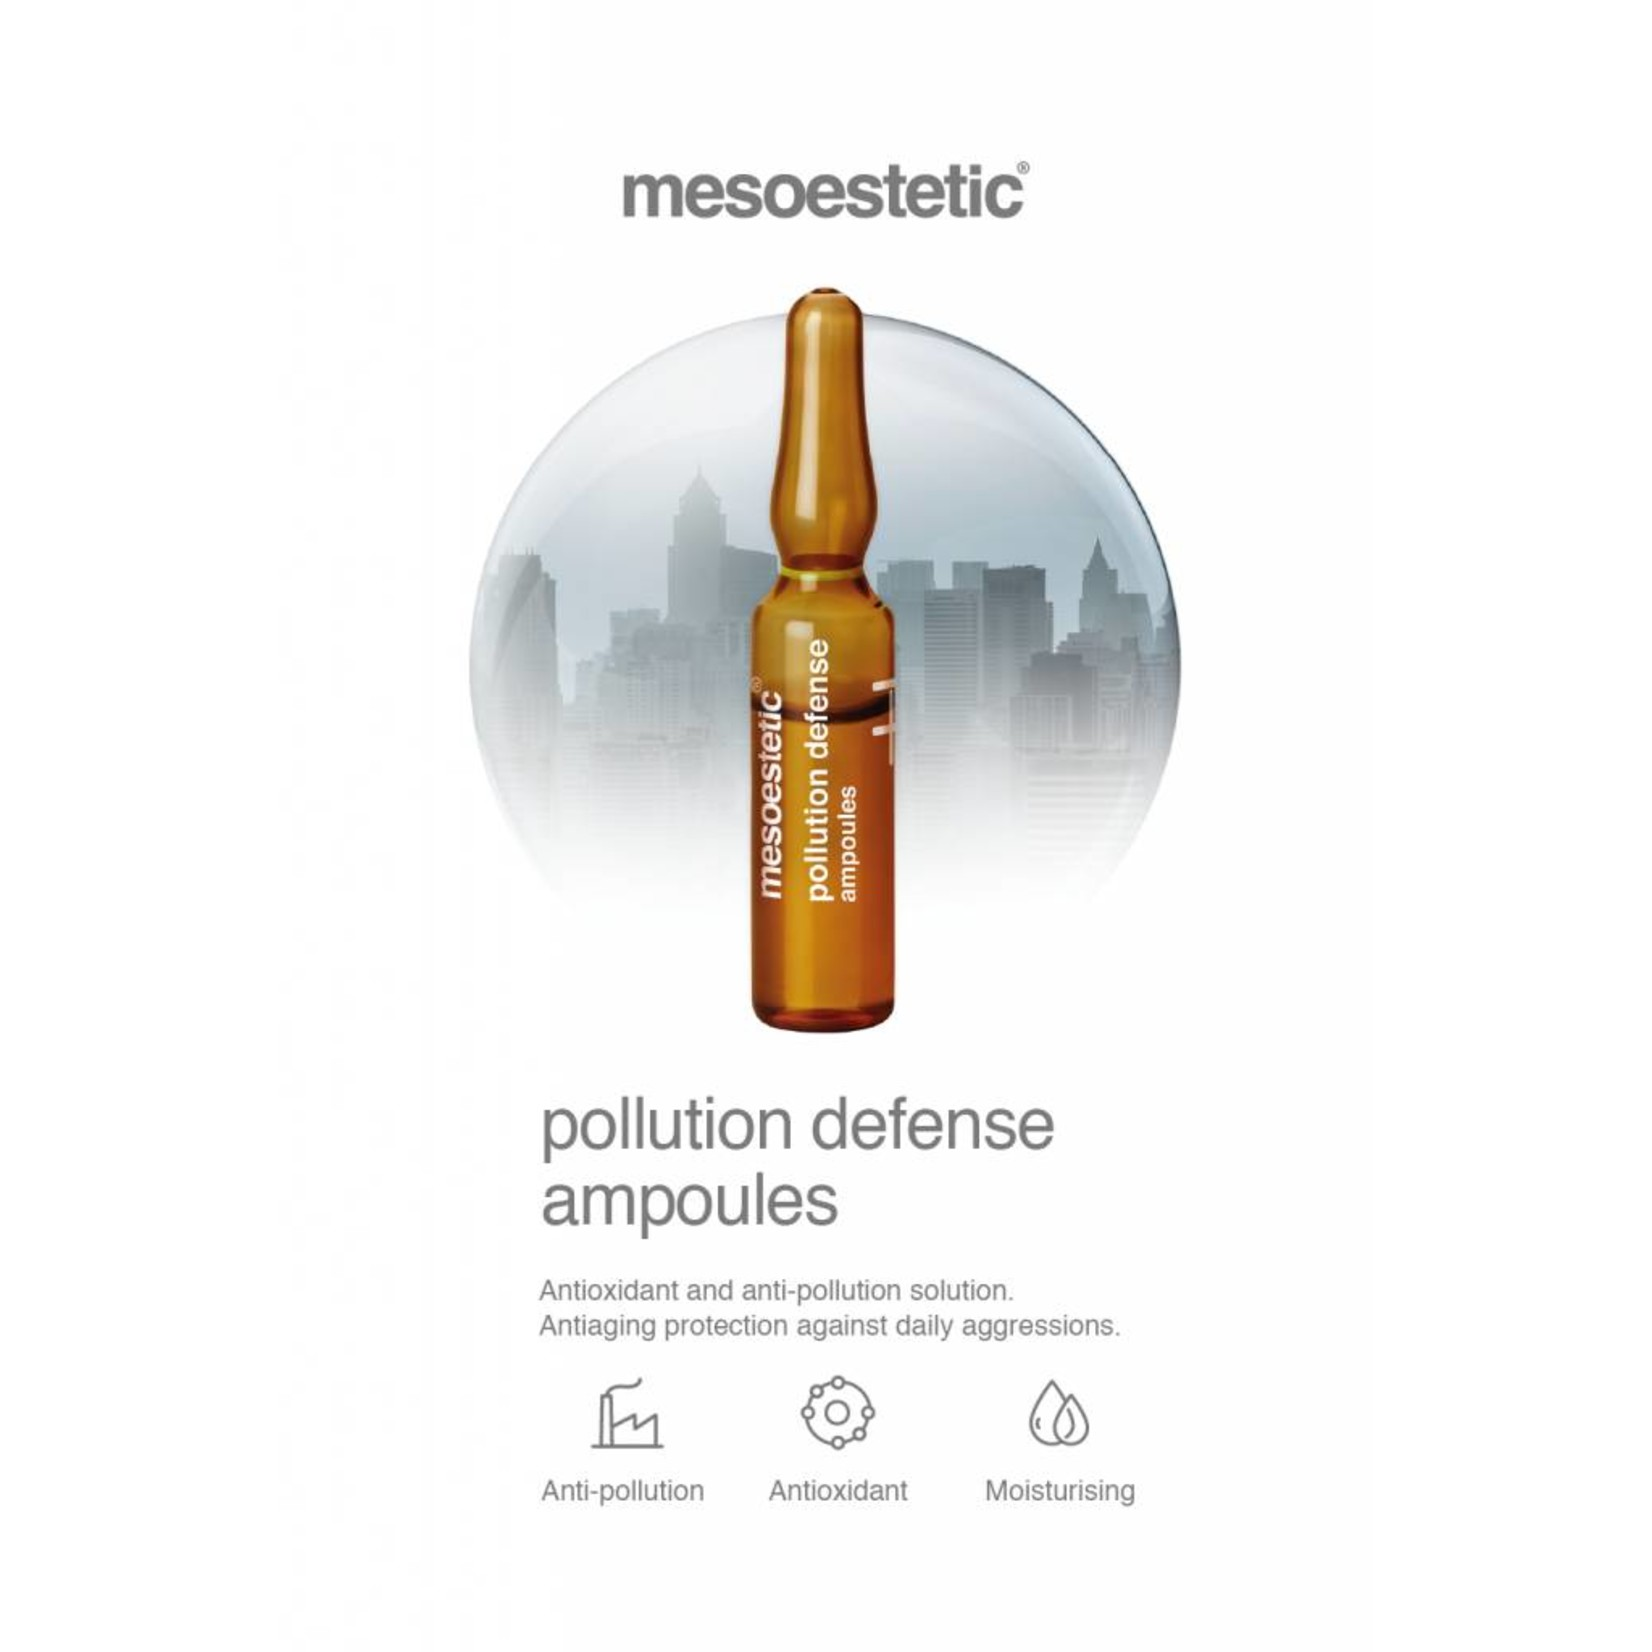 Mesoestetic Antioxidant en antivervuilingampoules